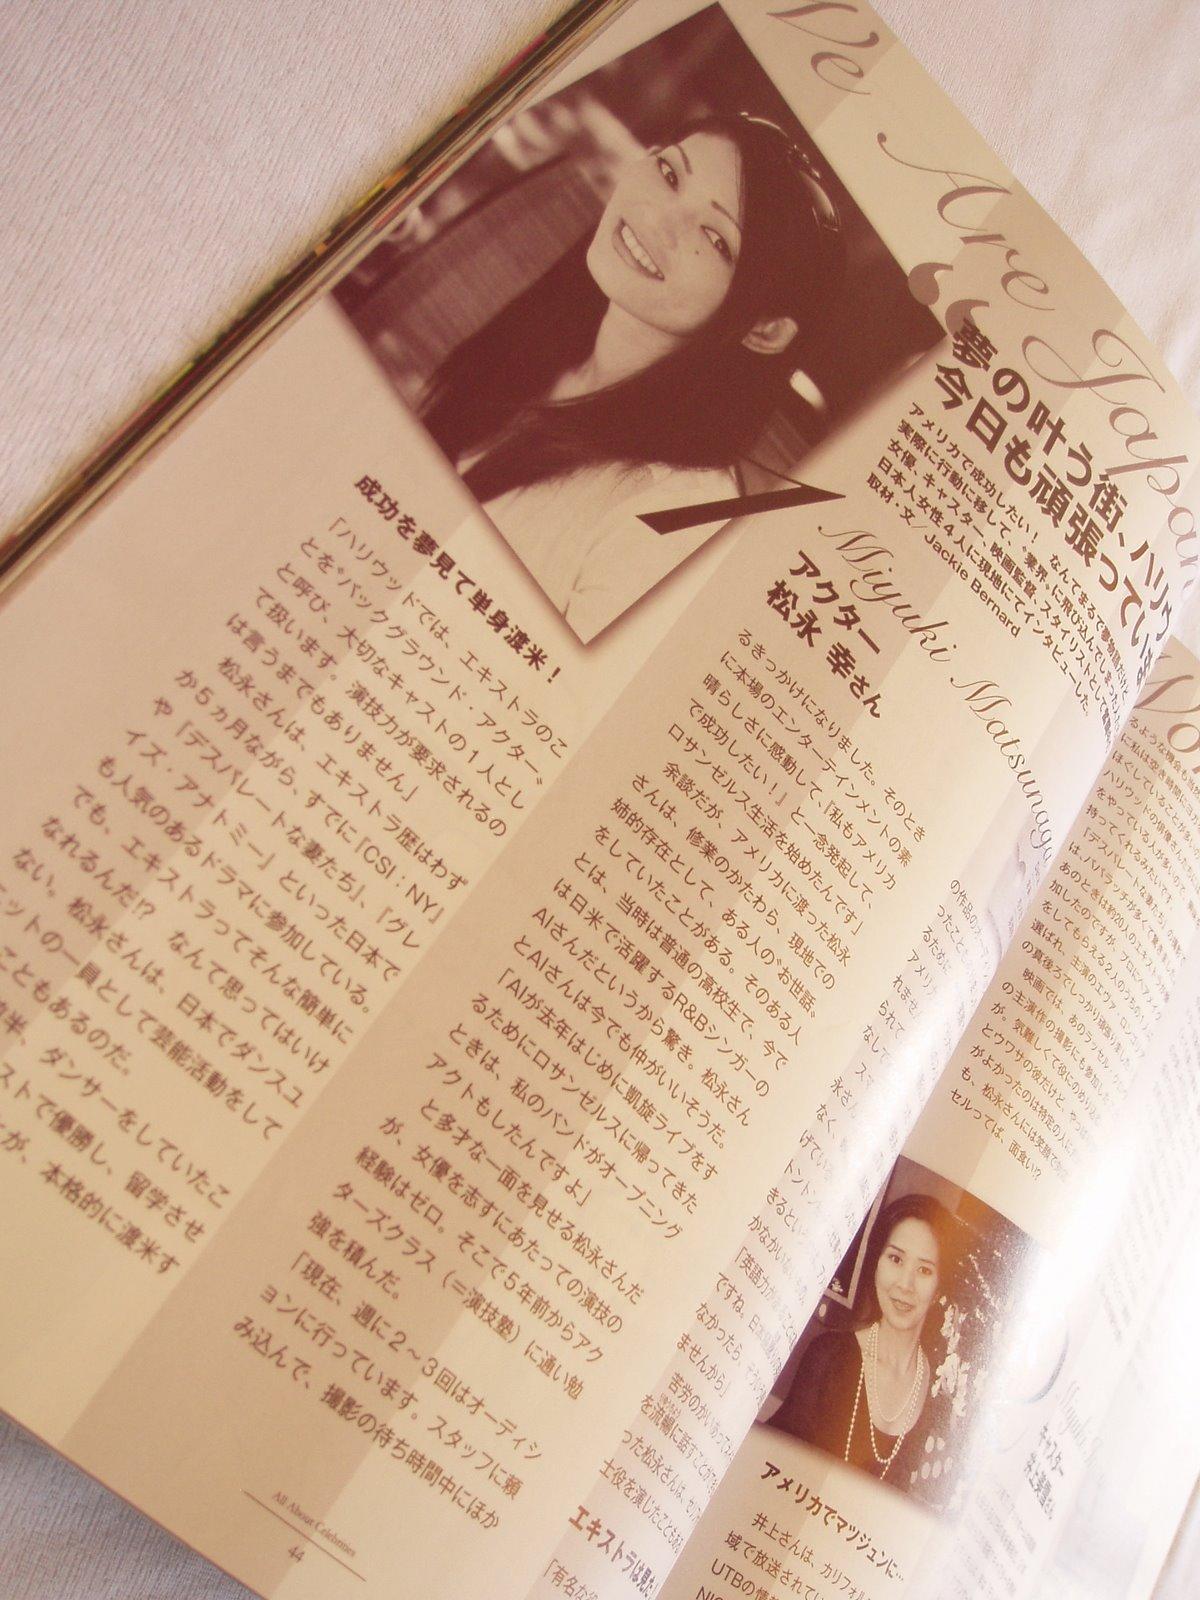 Miyuki+Matsunaga+All+Bout+cerebrities